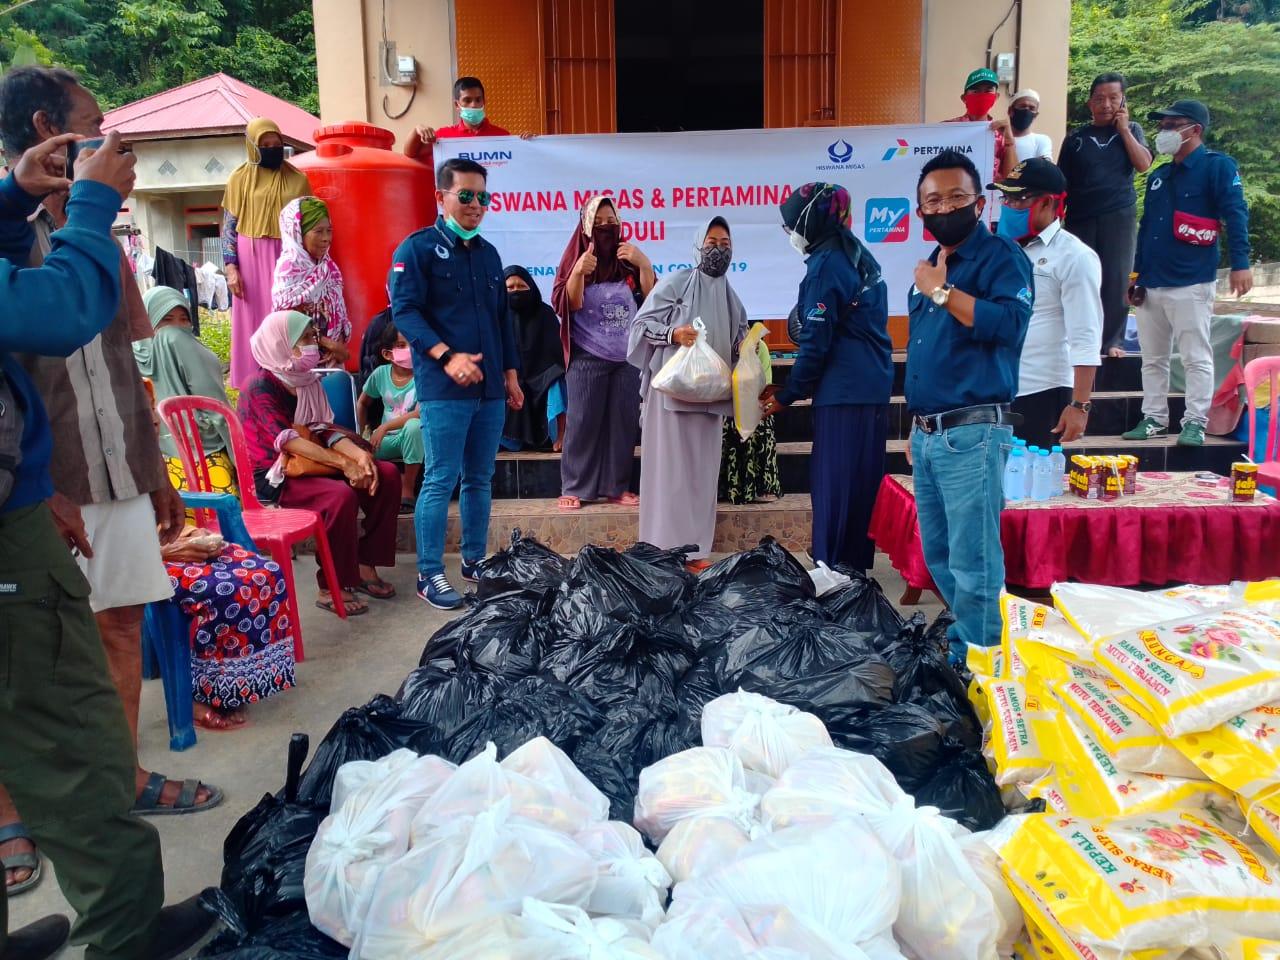 Pertamina Bersama Hiswana Migas Bagikan Ratusan Paket Sembako di Kendari